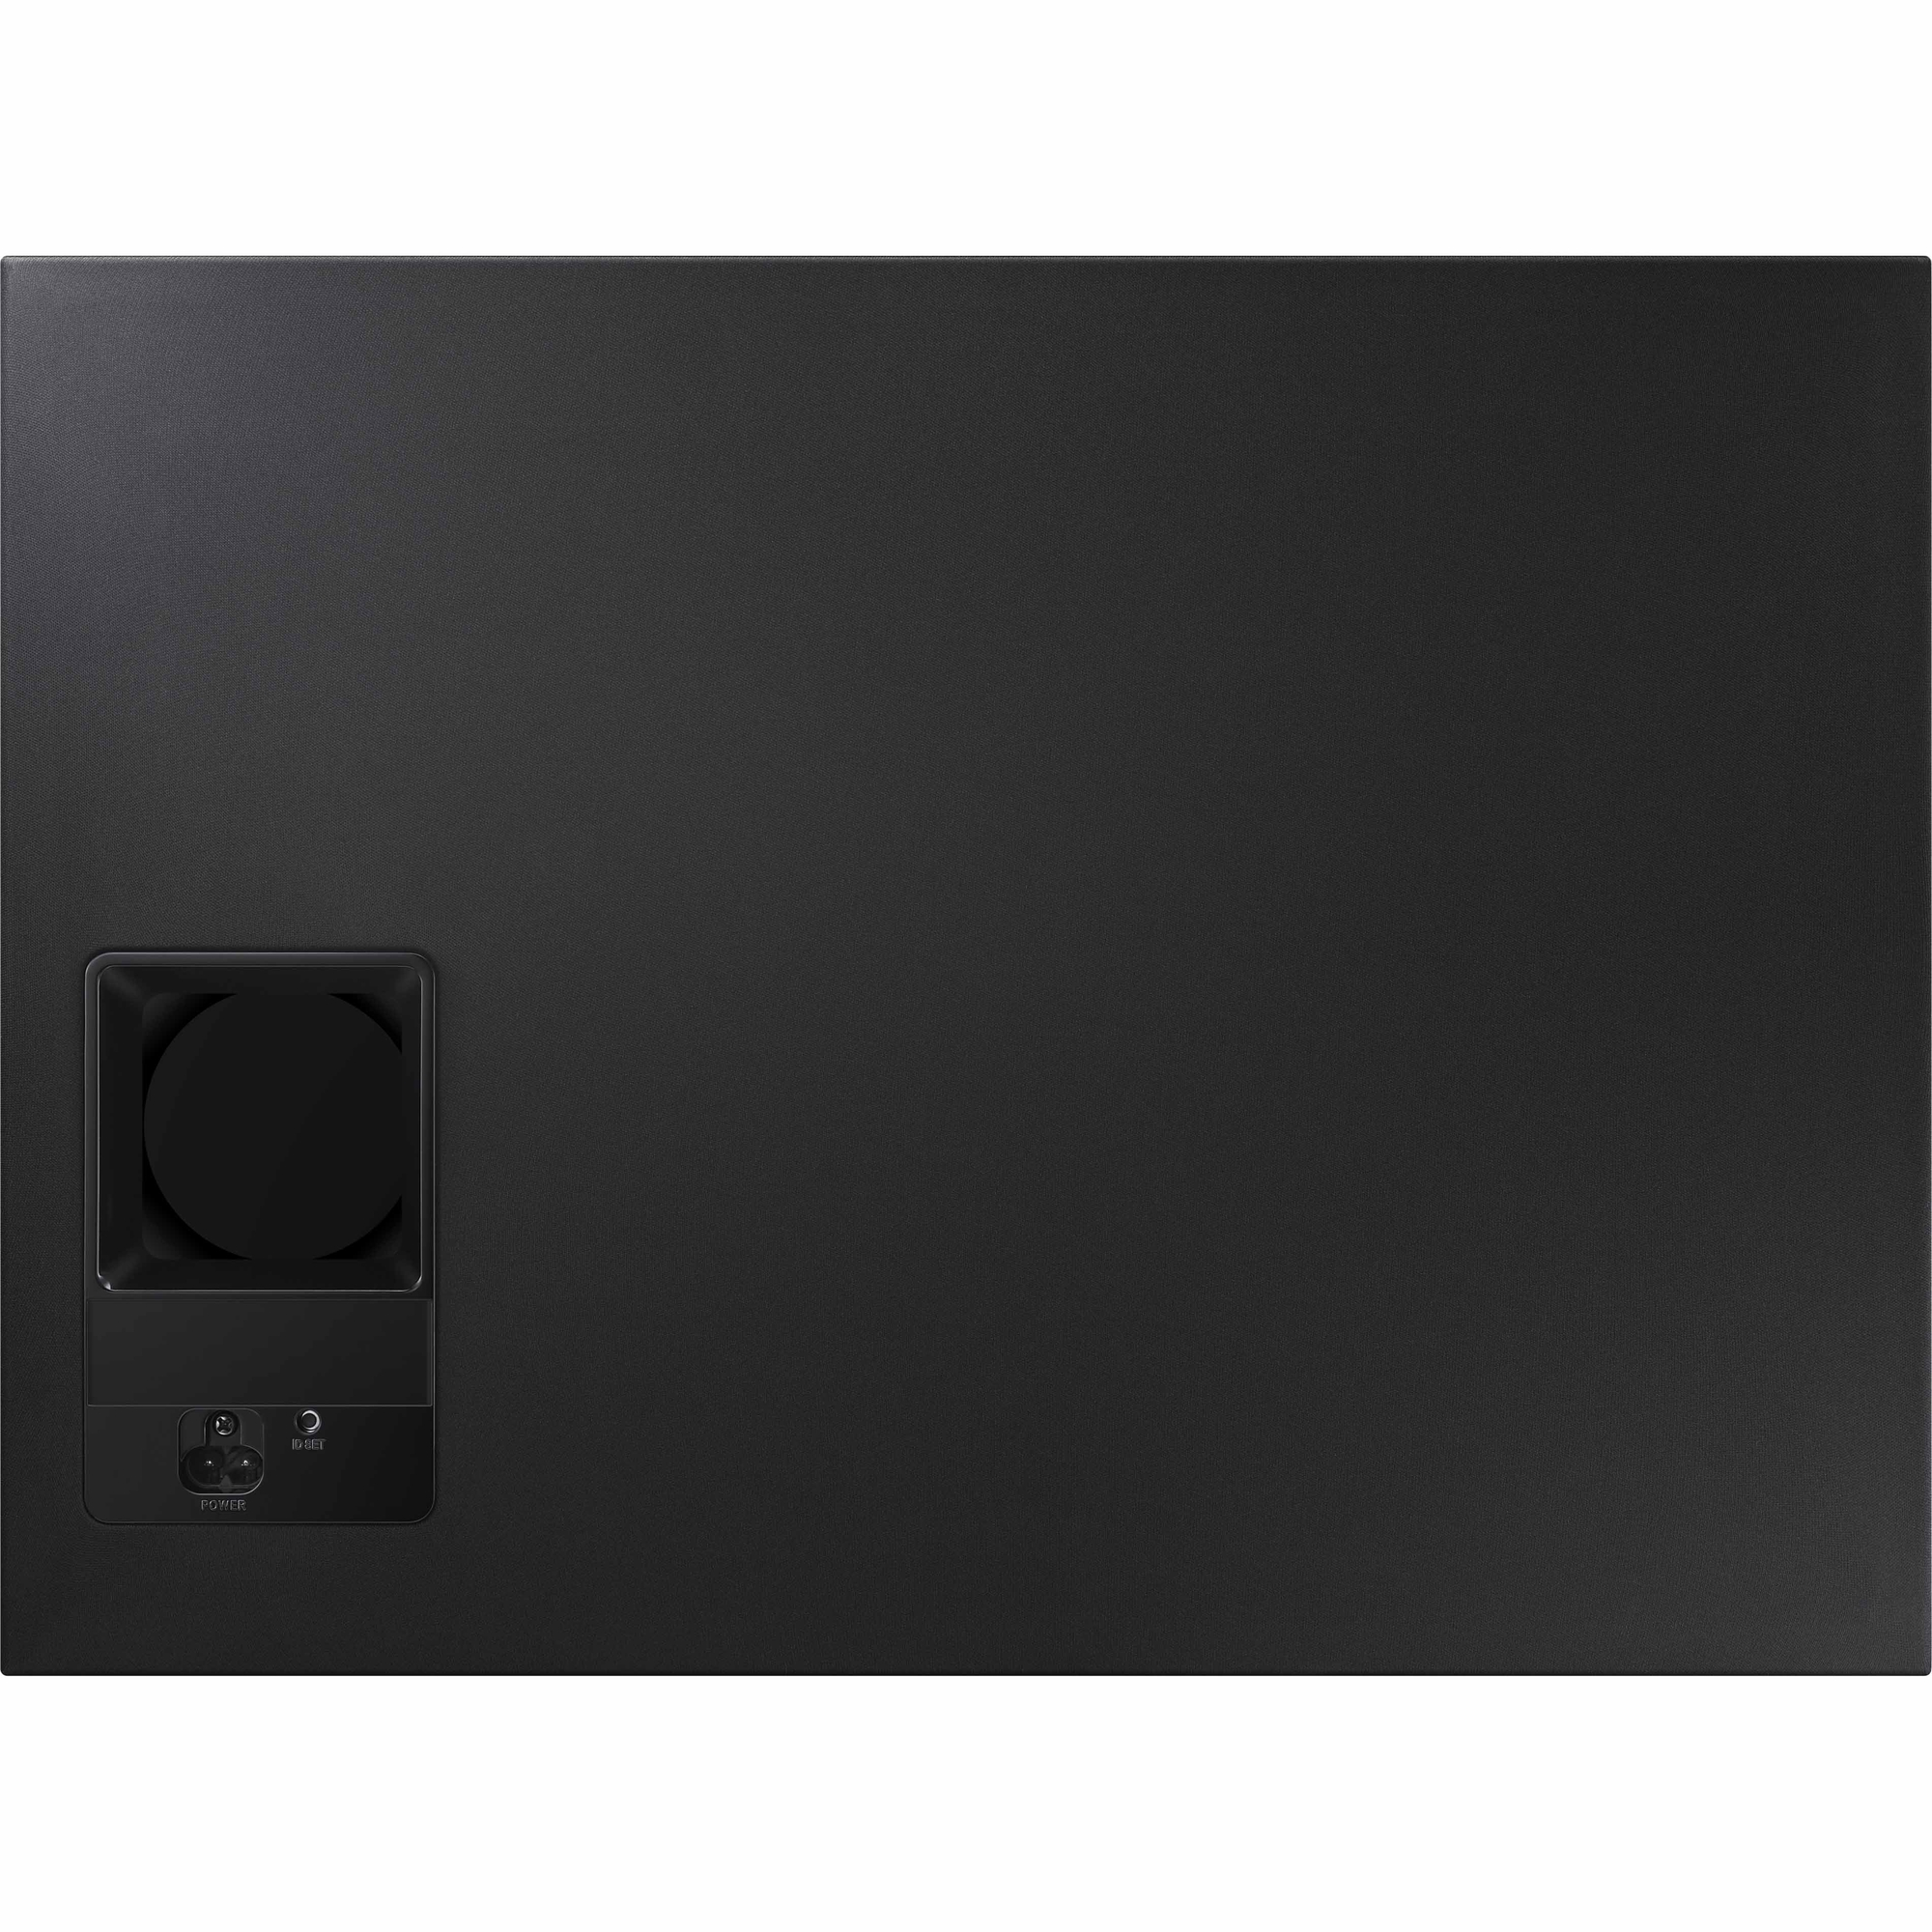 Samsung 3.1-Channel 340W Soundbar w/ Wireless Active Subwoofer - HW-K550